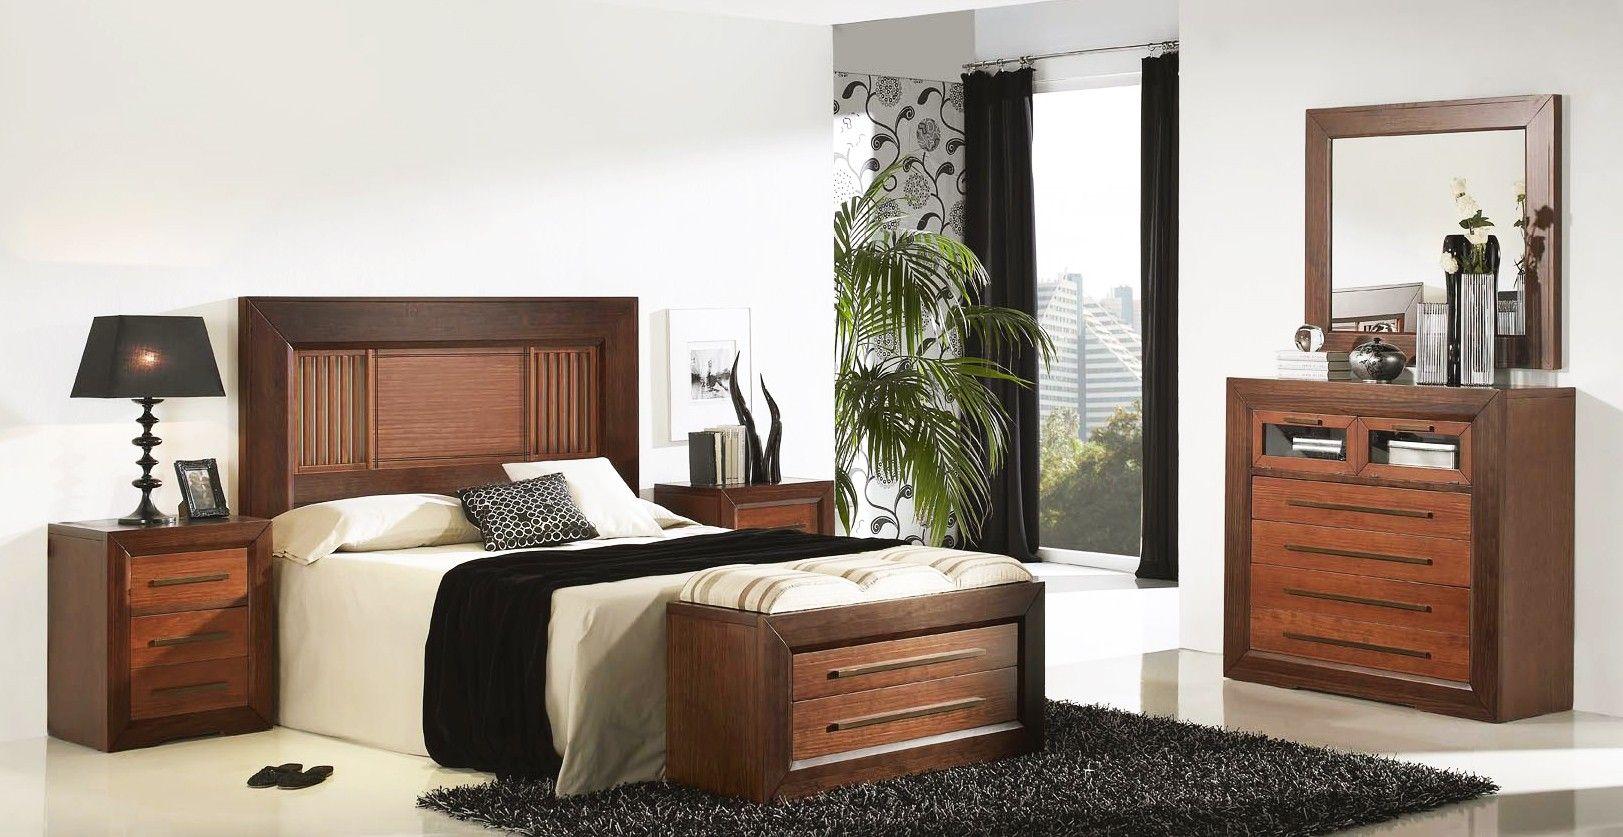 Dormitorio de matrimonio realizado en madera de pino for Decoracion comodas habitacion matrimonio